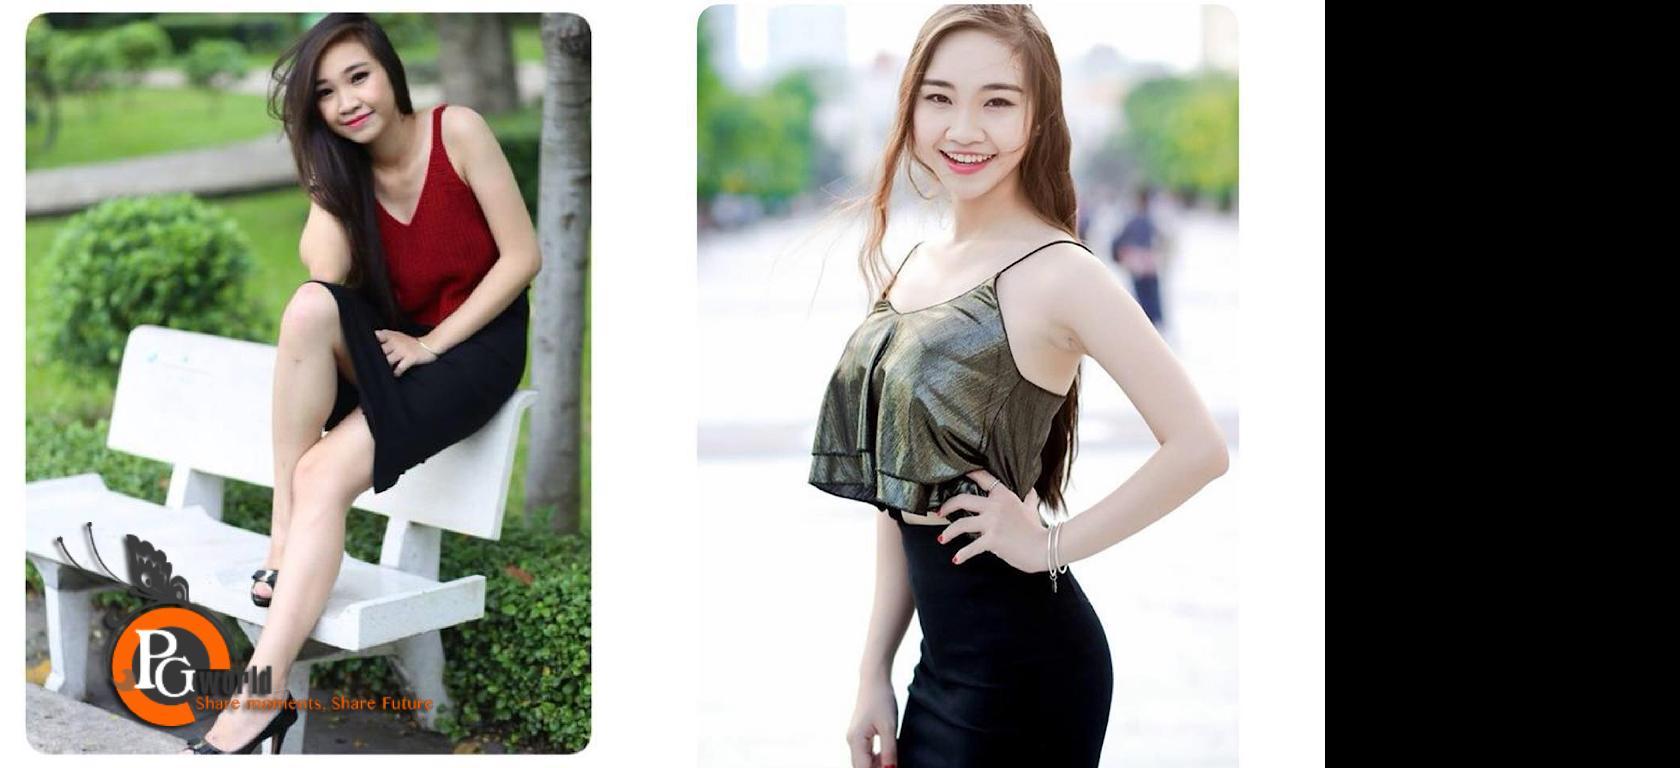 nguoi-mau-pg-model-thanh-phuong